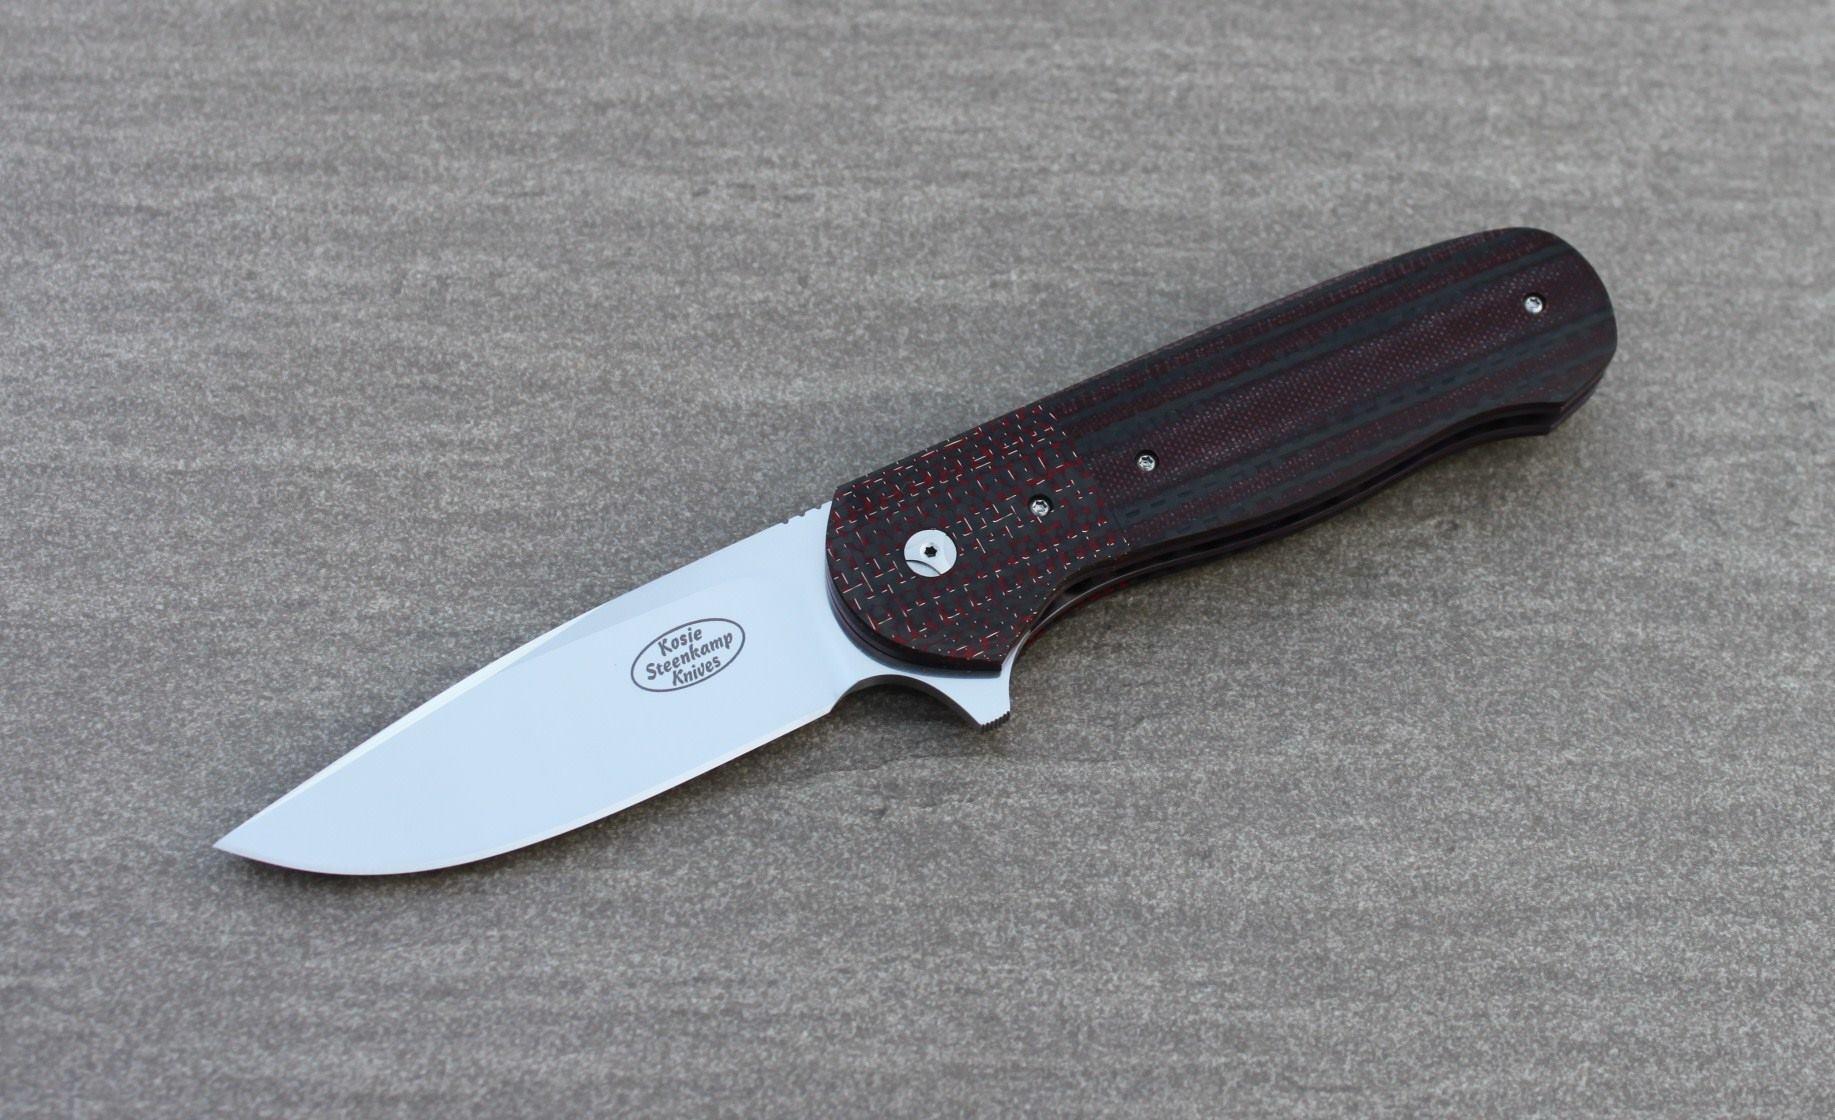 Knife: Vantage Flipper Liner Lock - IKBS. Böhler N690 Stainless Steel blade. Titanium liners with red LSCF + red and black G10 handle scales. Titanium belt clip.